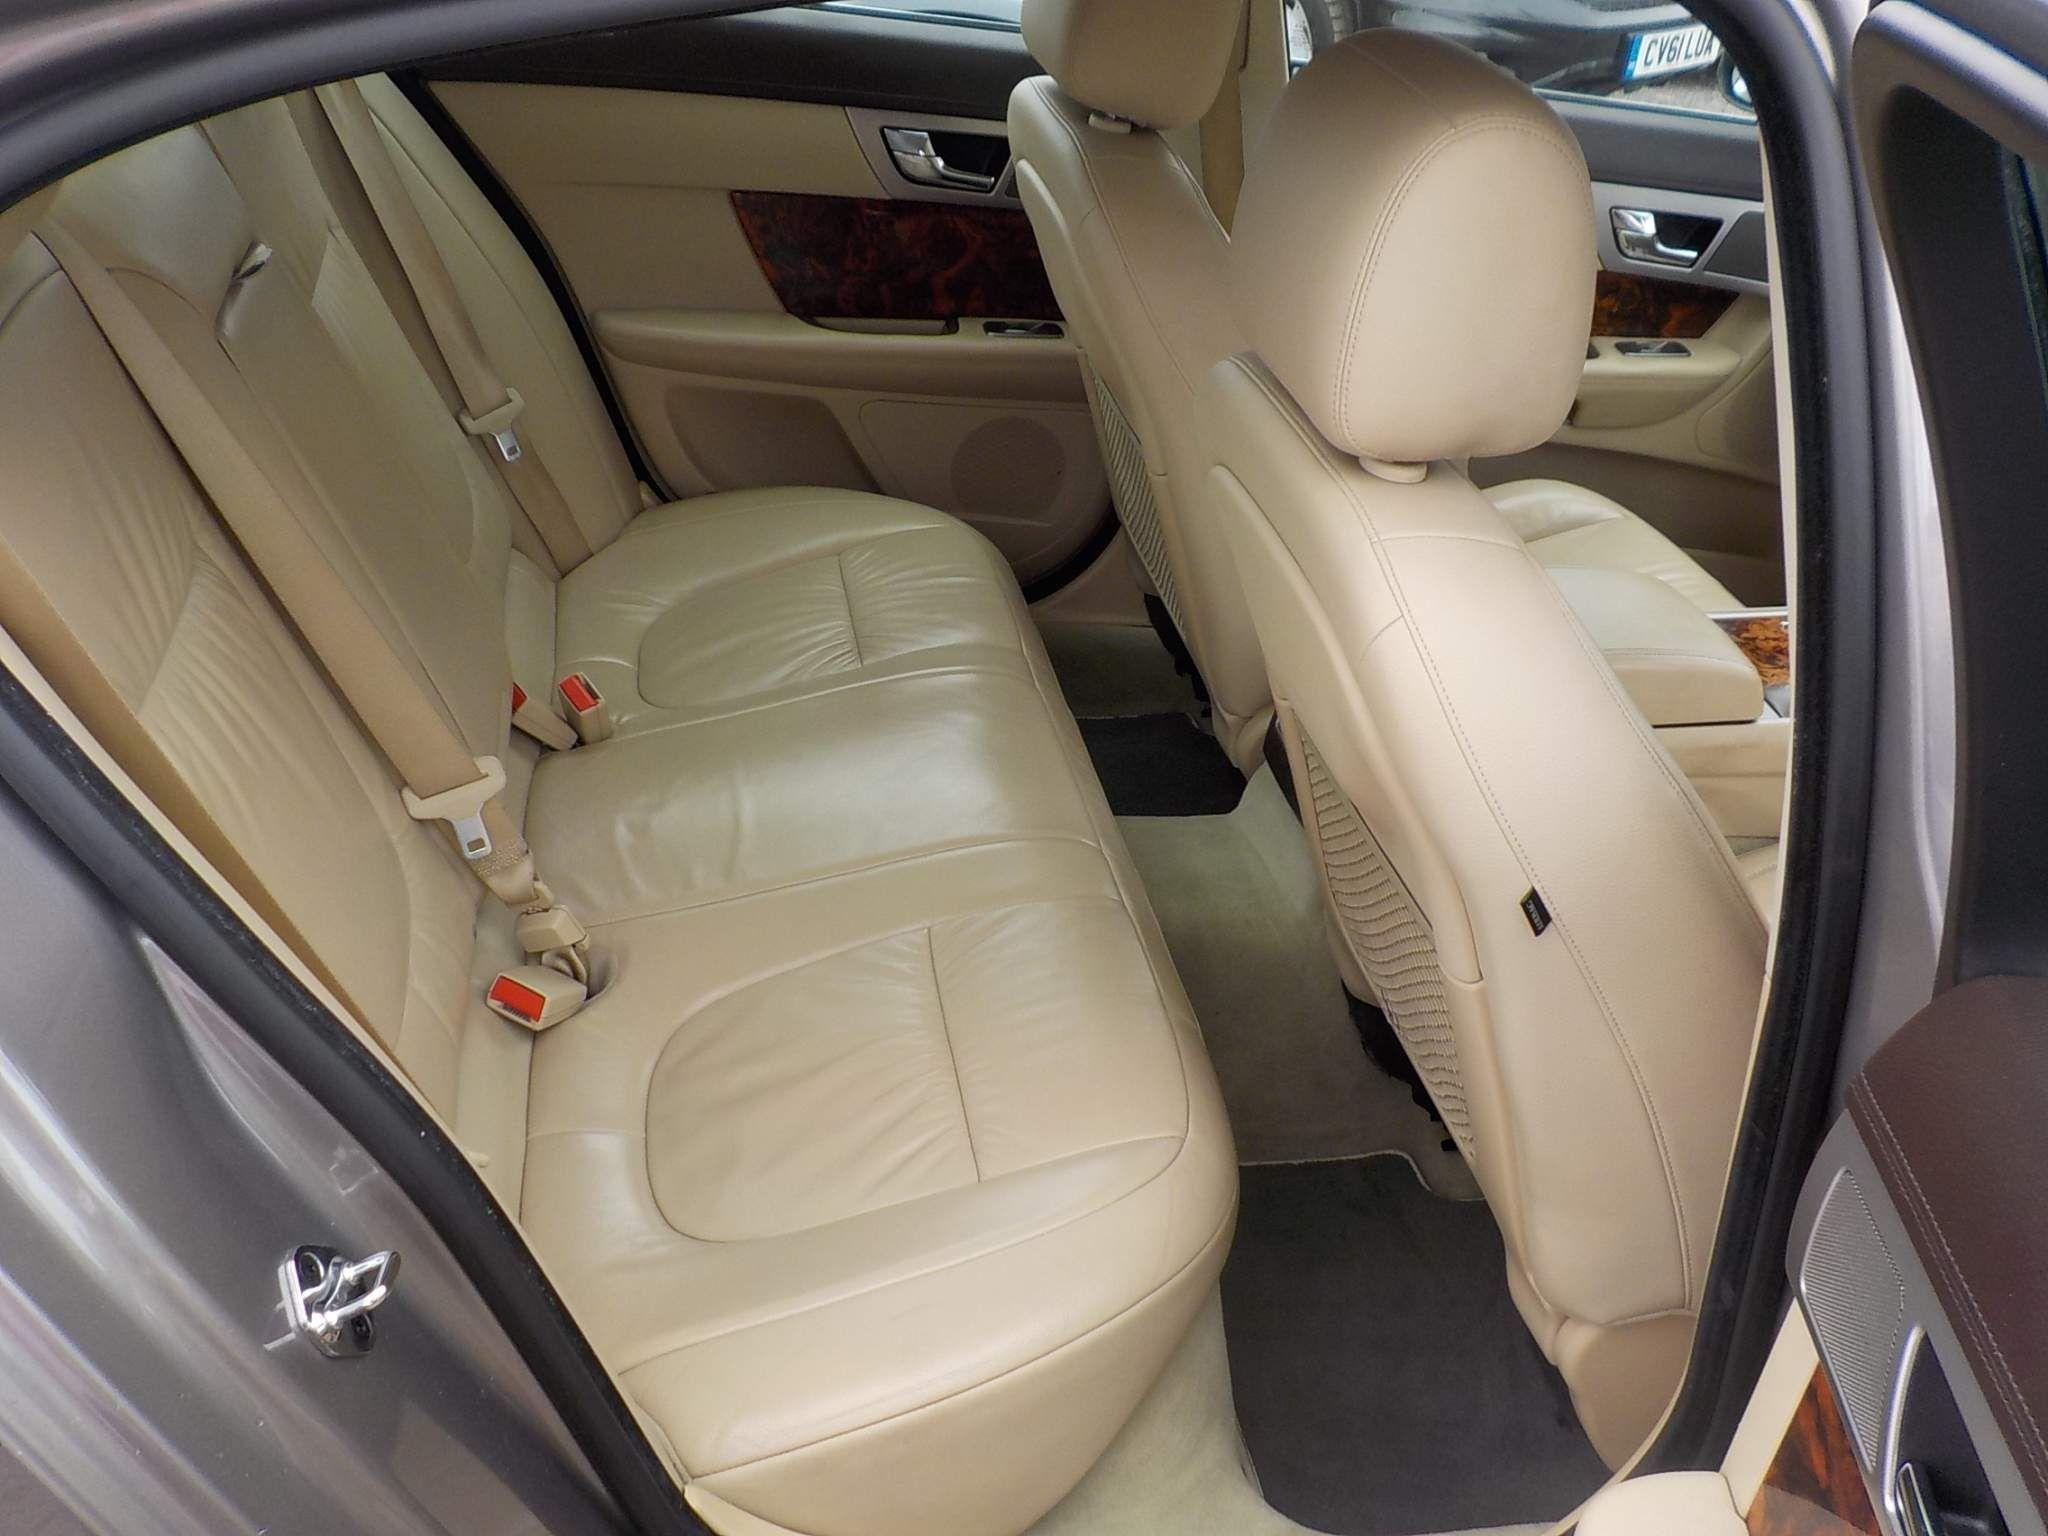 Jaguar XF 2.7 TD Luxury 4dr